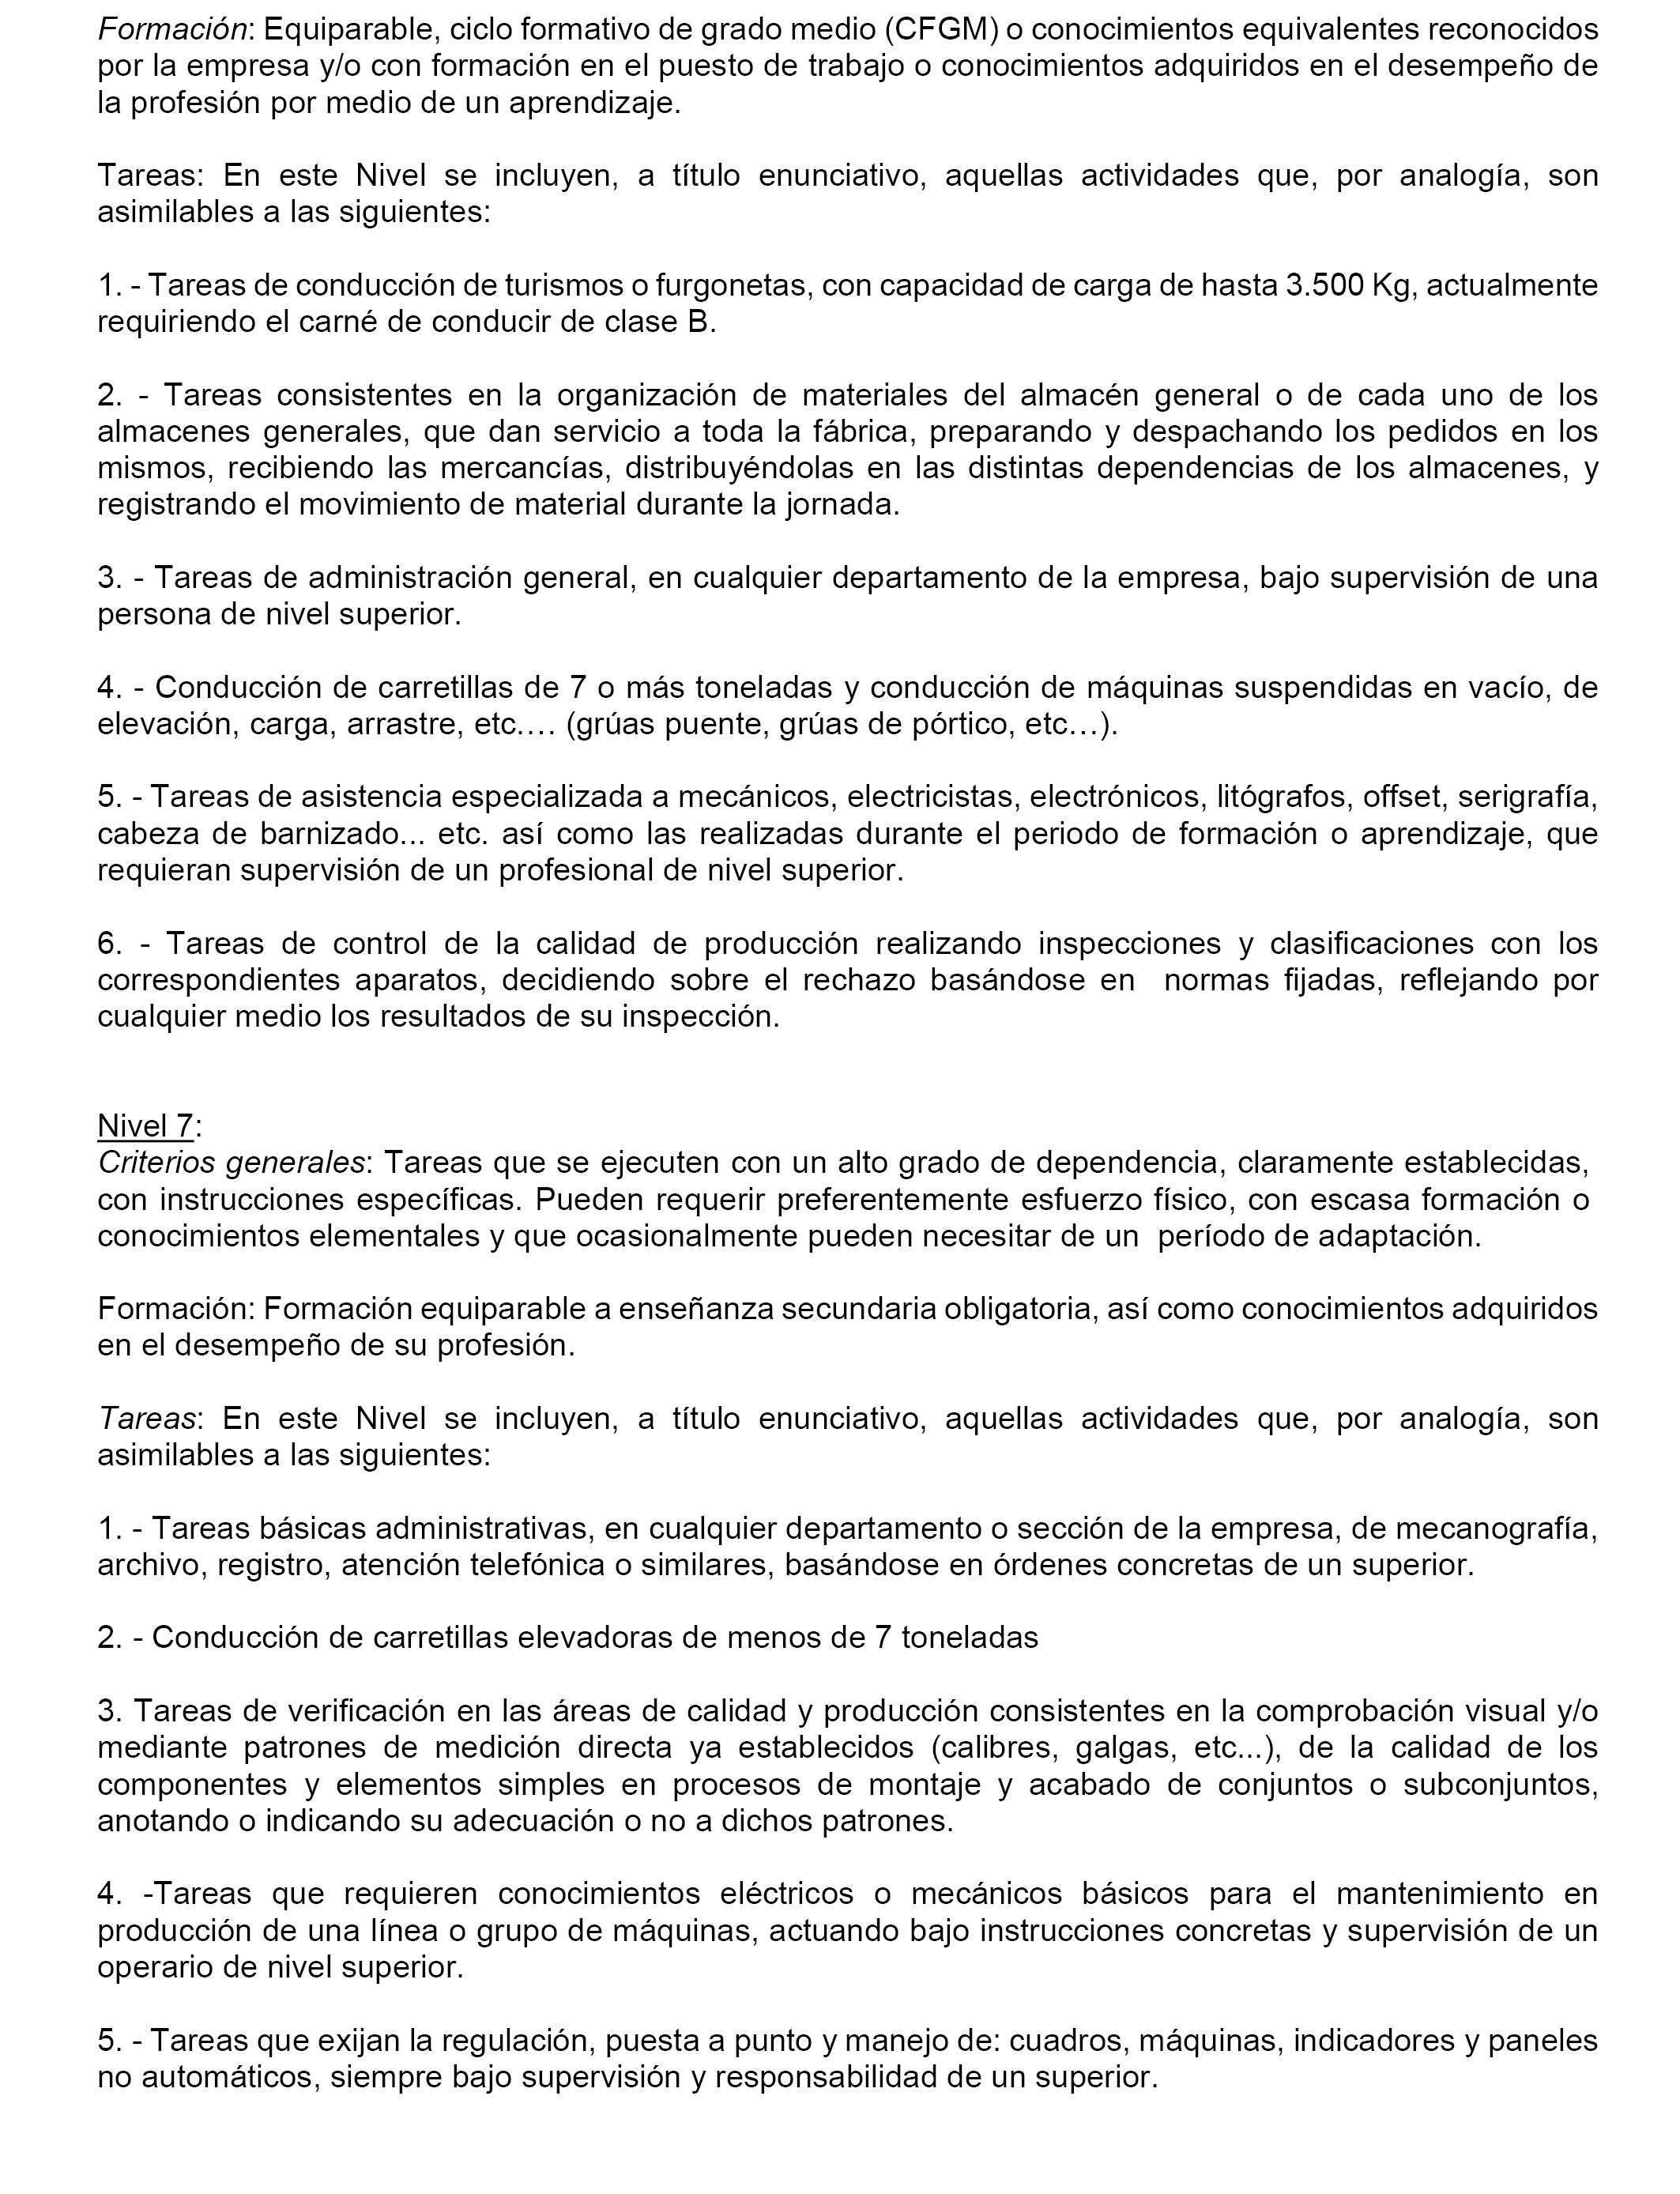 BOE.es - Documento BOE-A-2017-10774